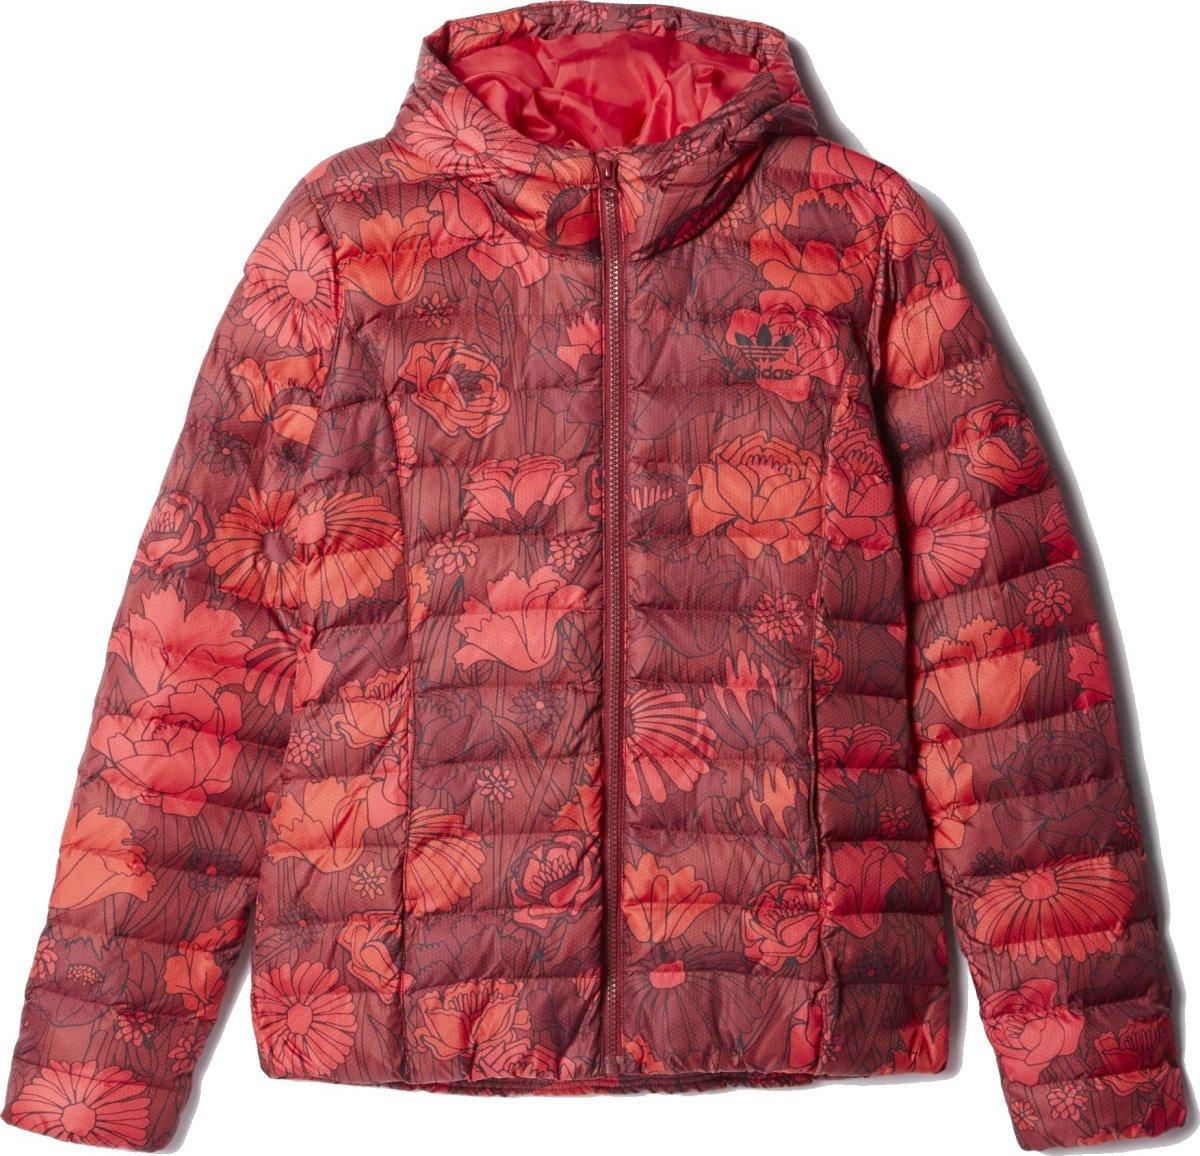 adidas bunda cervena • Zboží.cz 5173356bfa9